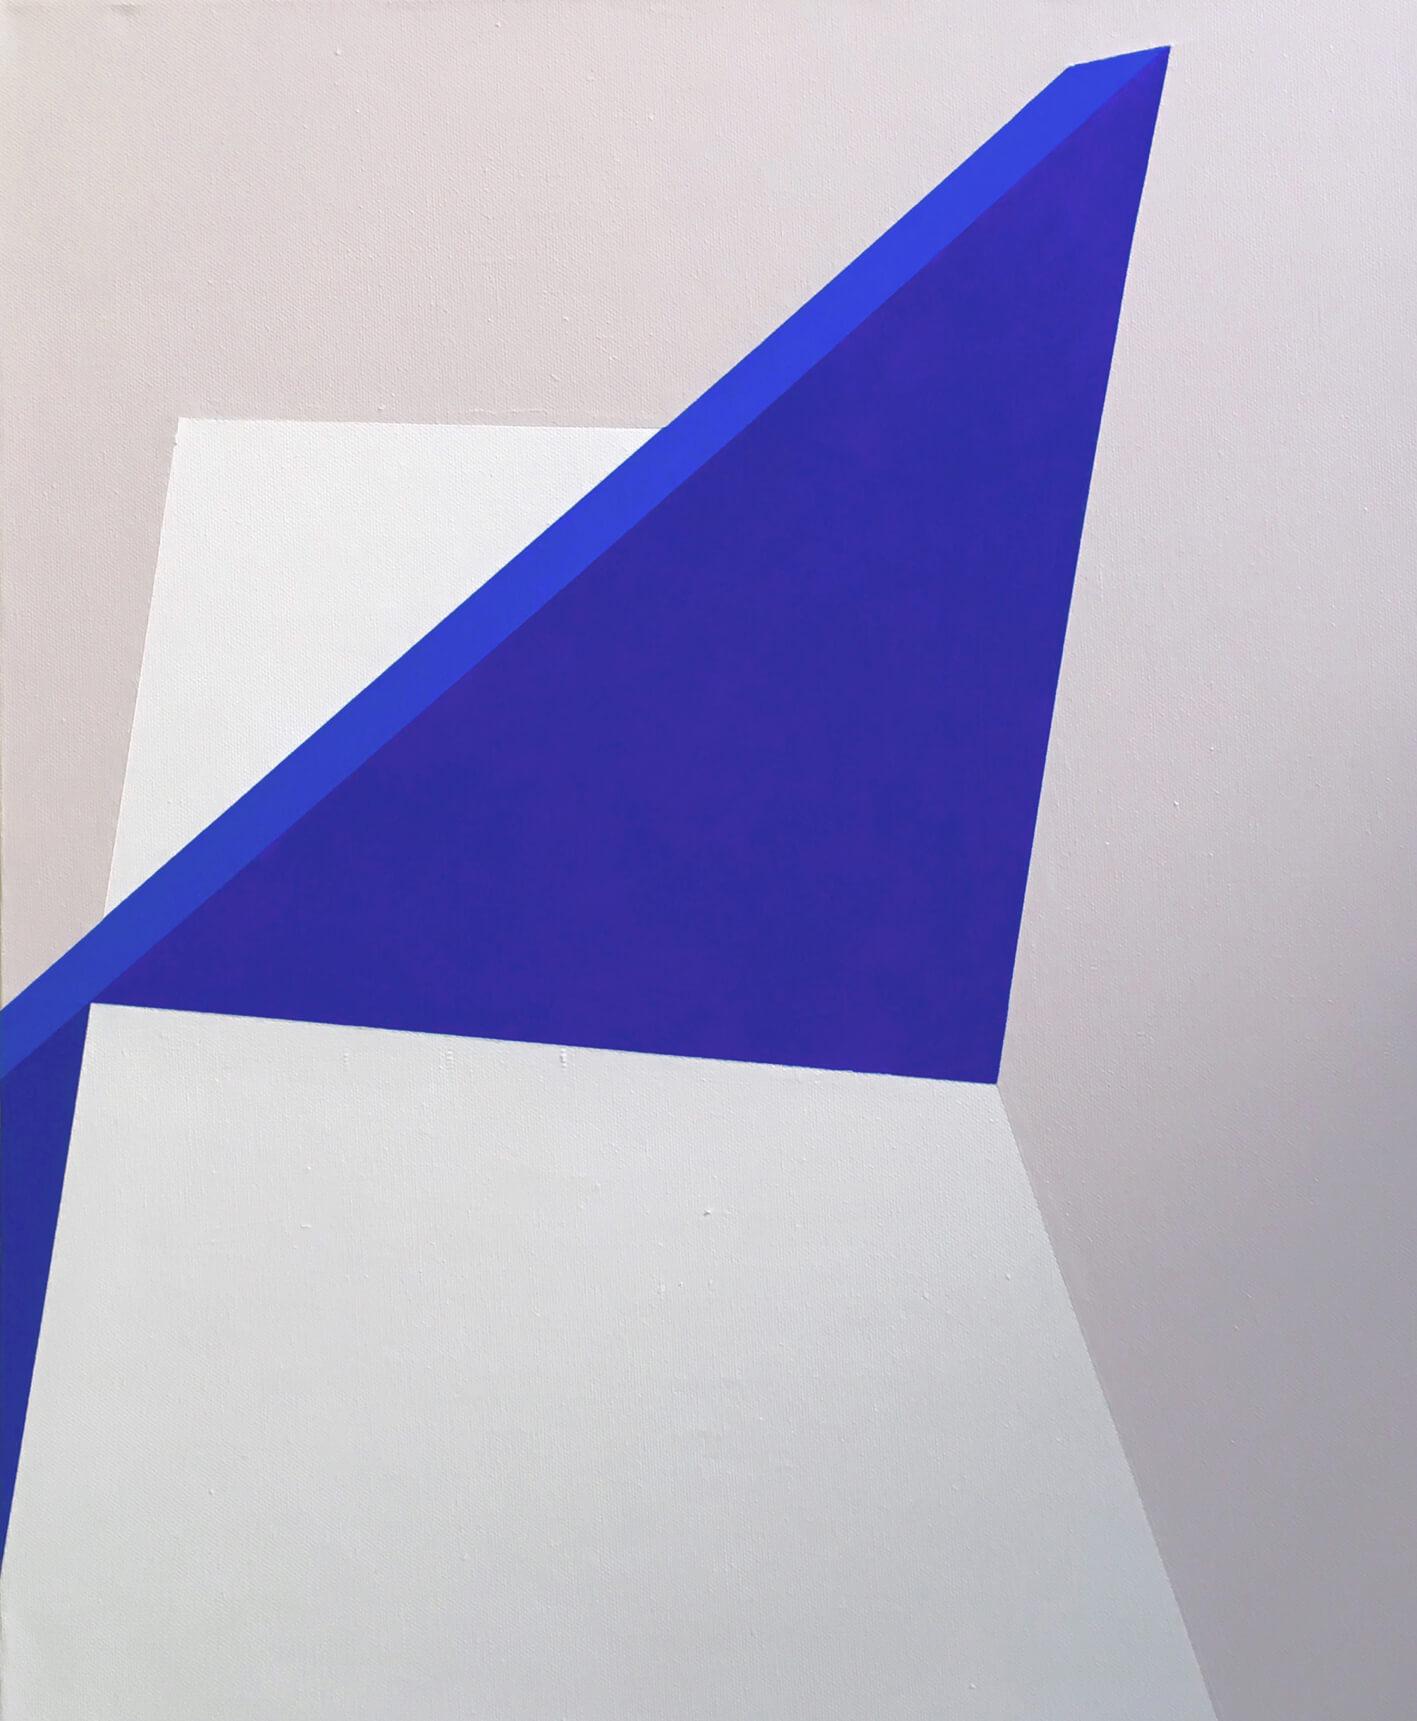 Minimal 14, 60 cm x 50 x 4 cm, Acryl auf Leinwand, © Ute Latzke, 2016, 500,- Euro.